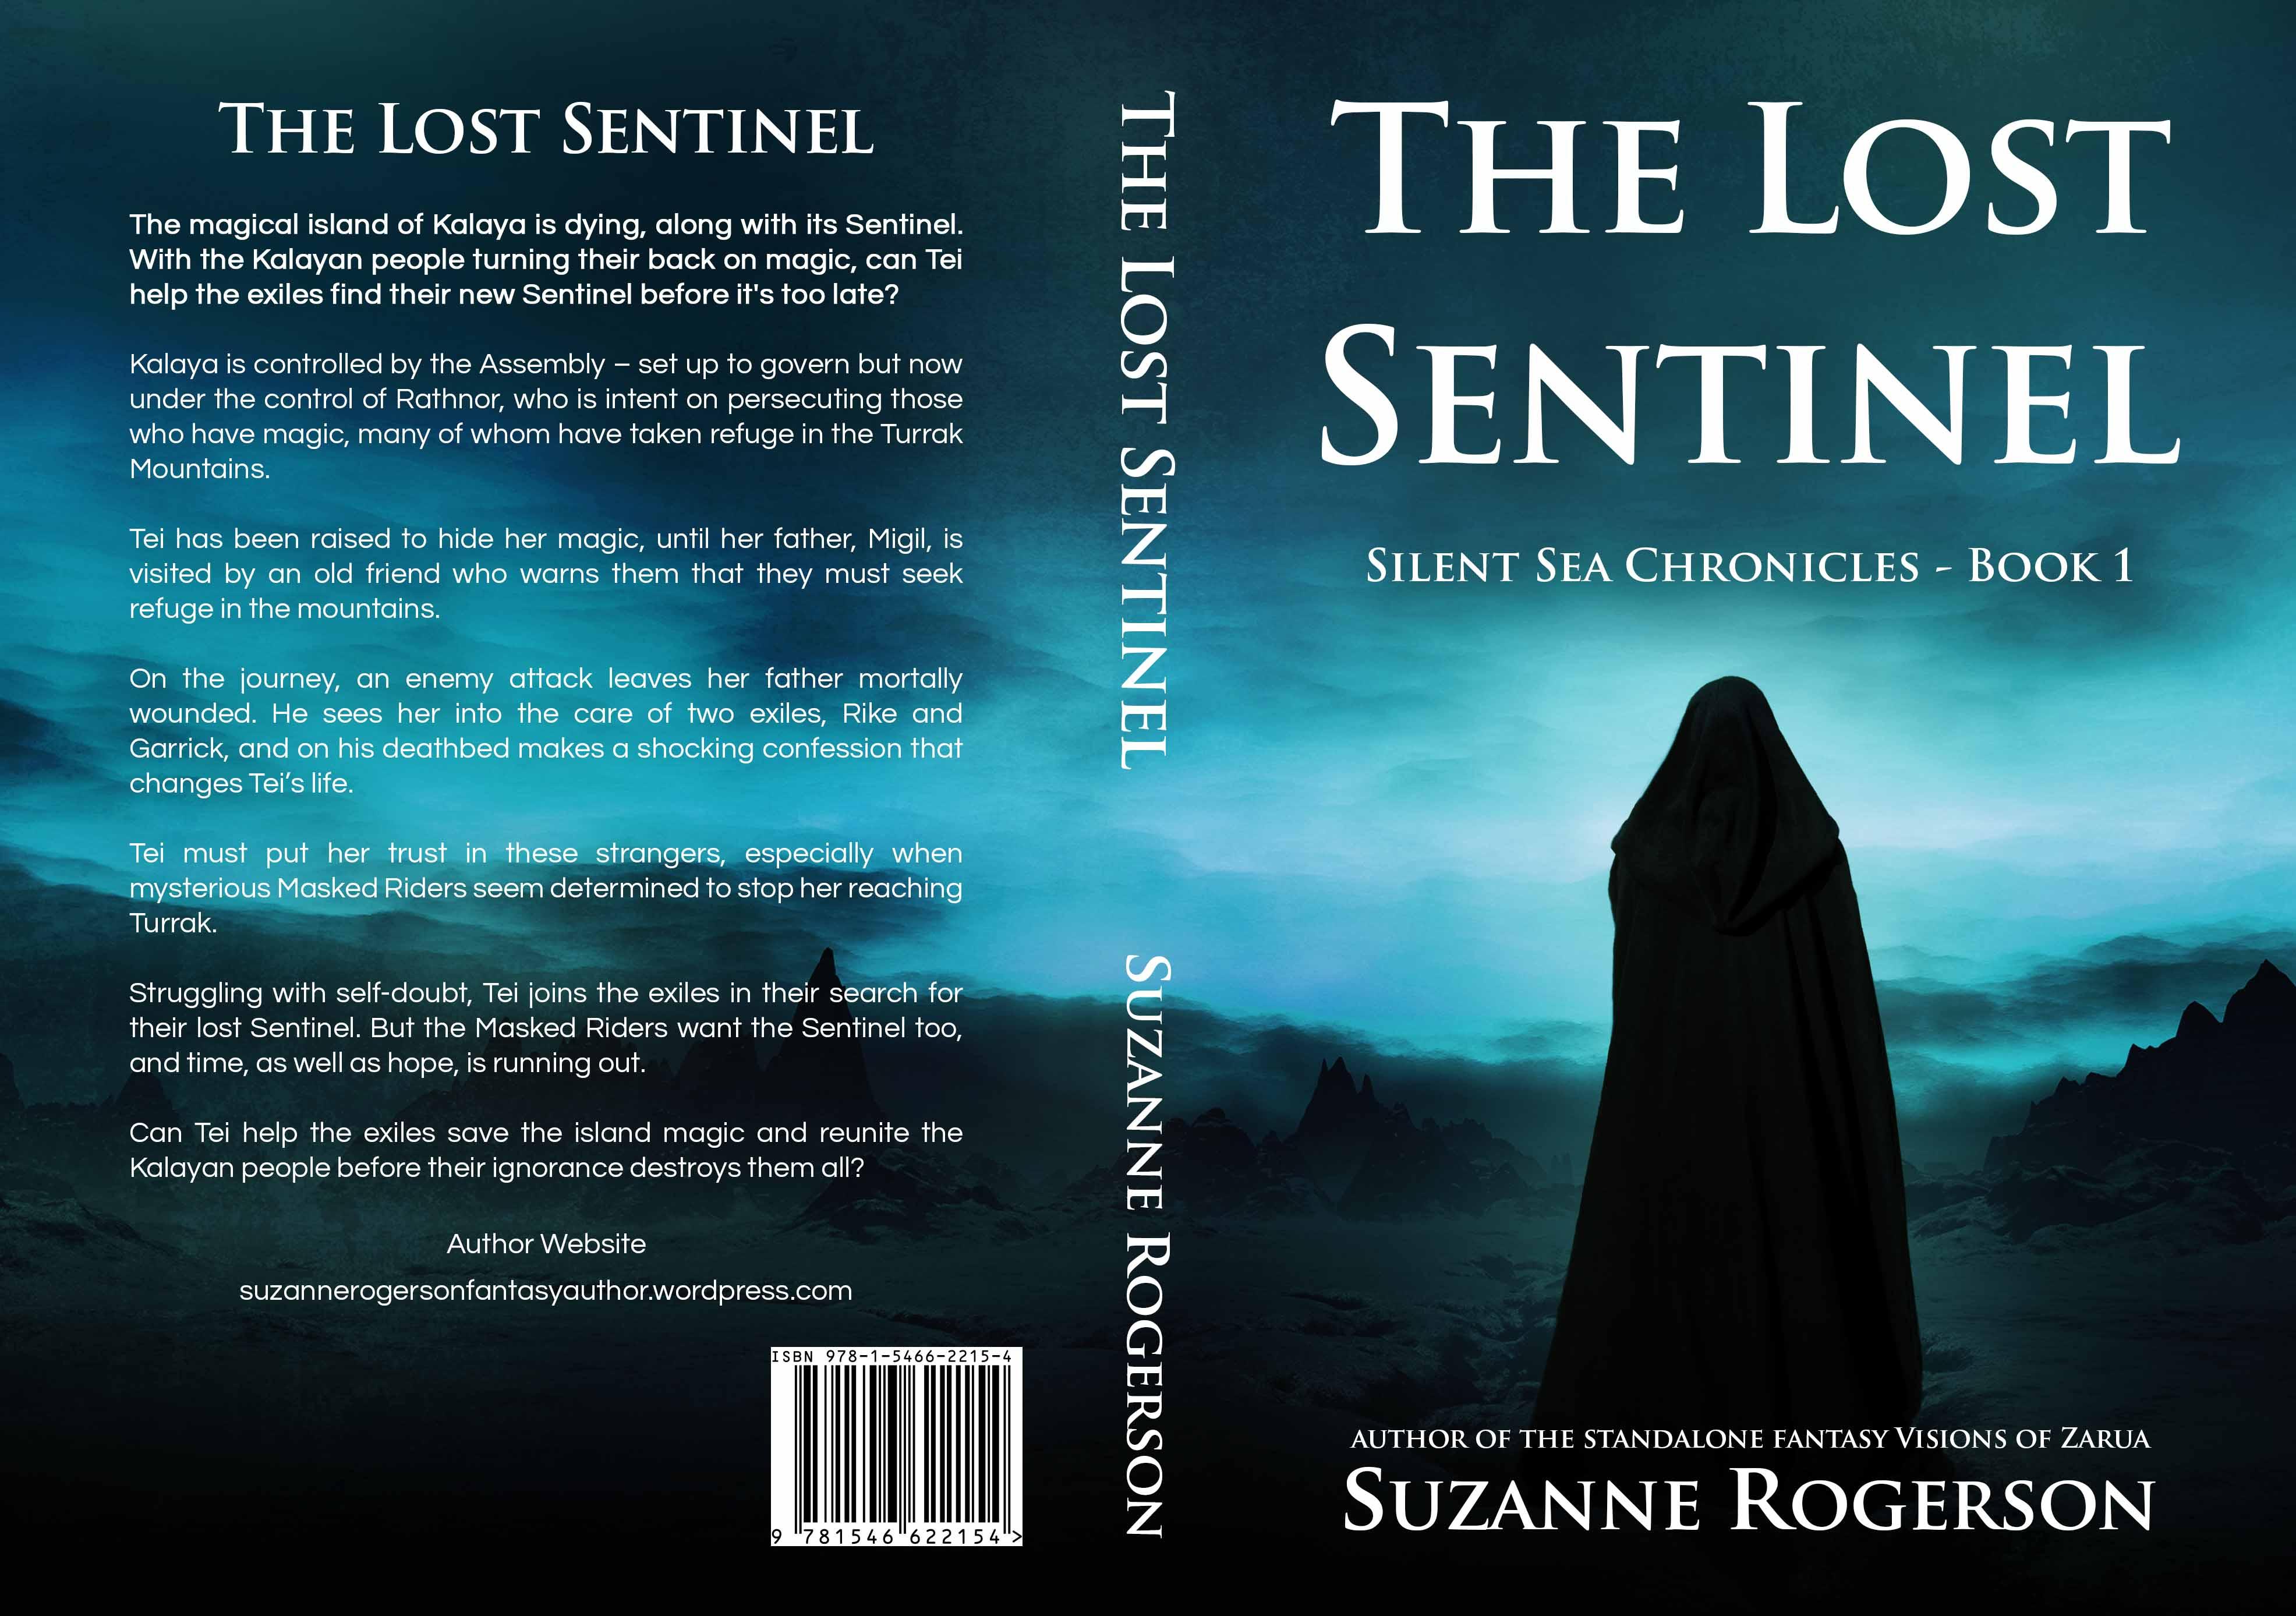 image paperback full spread